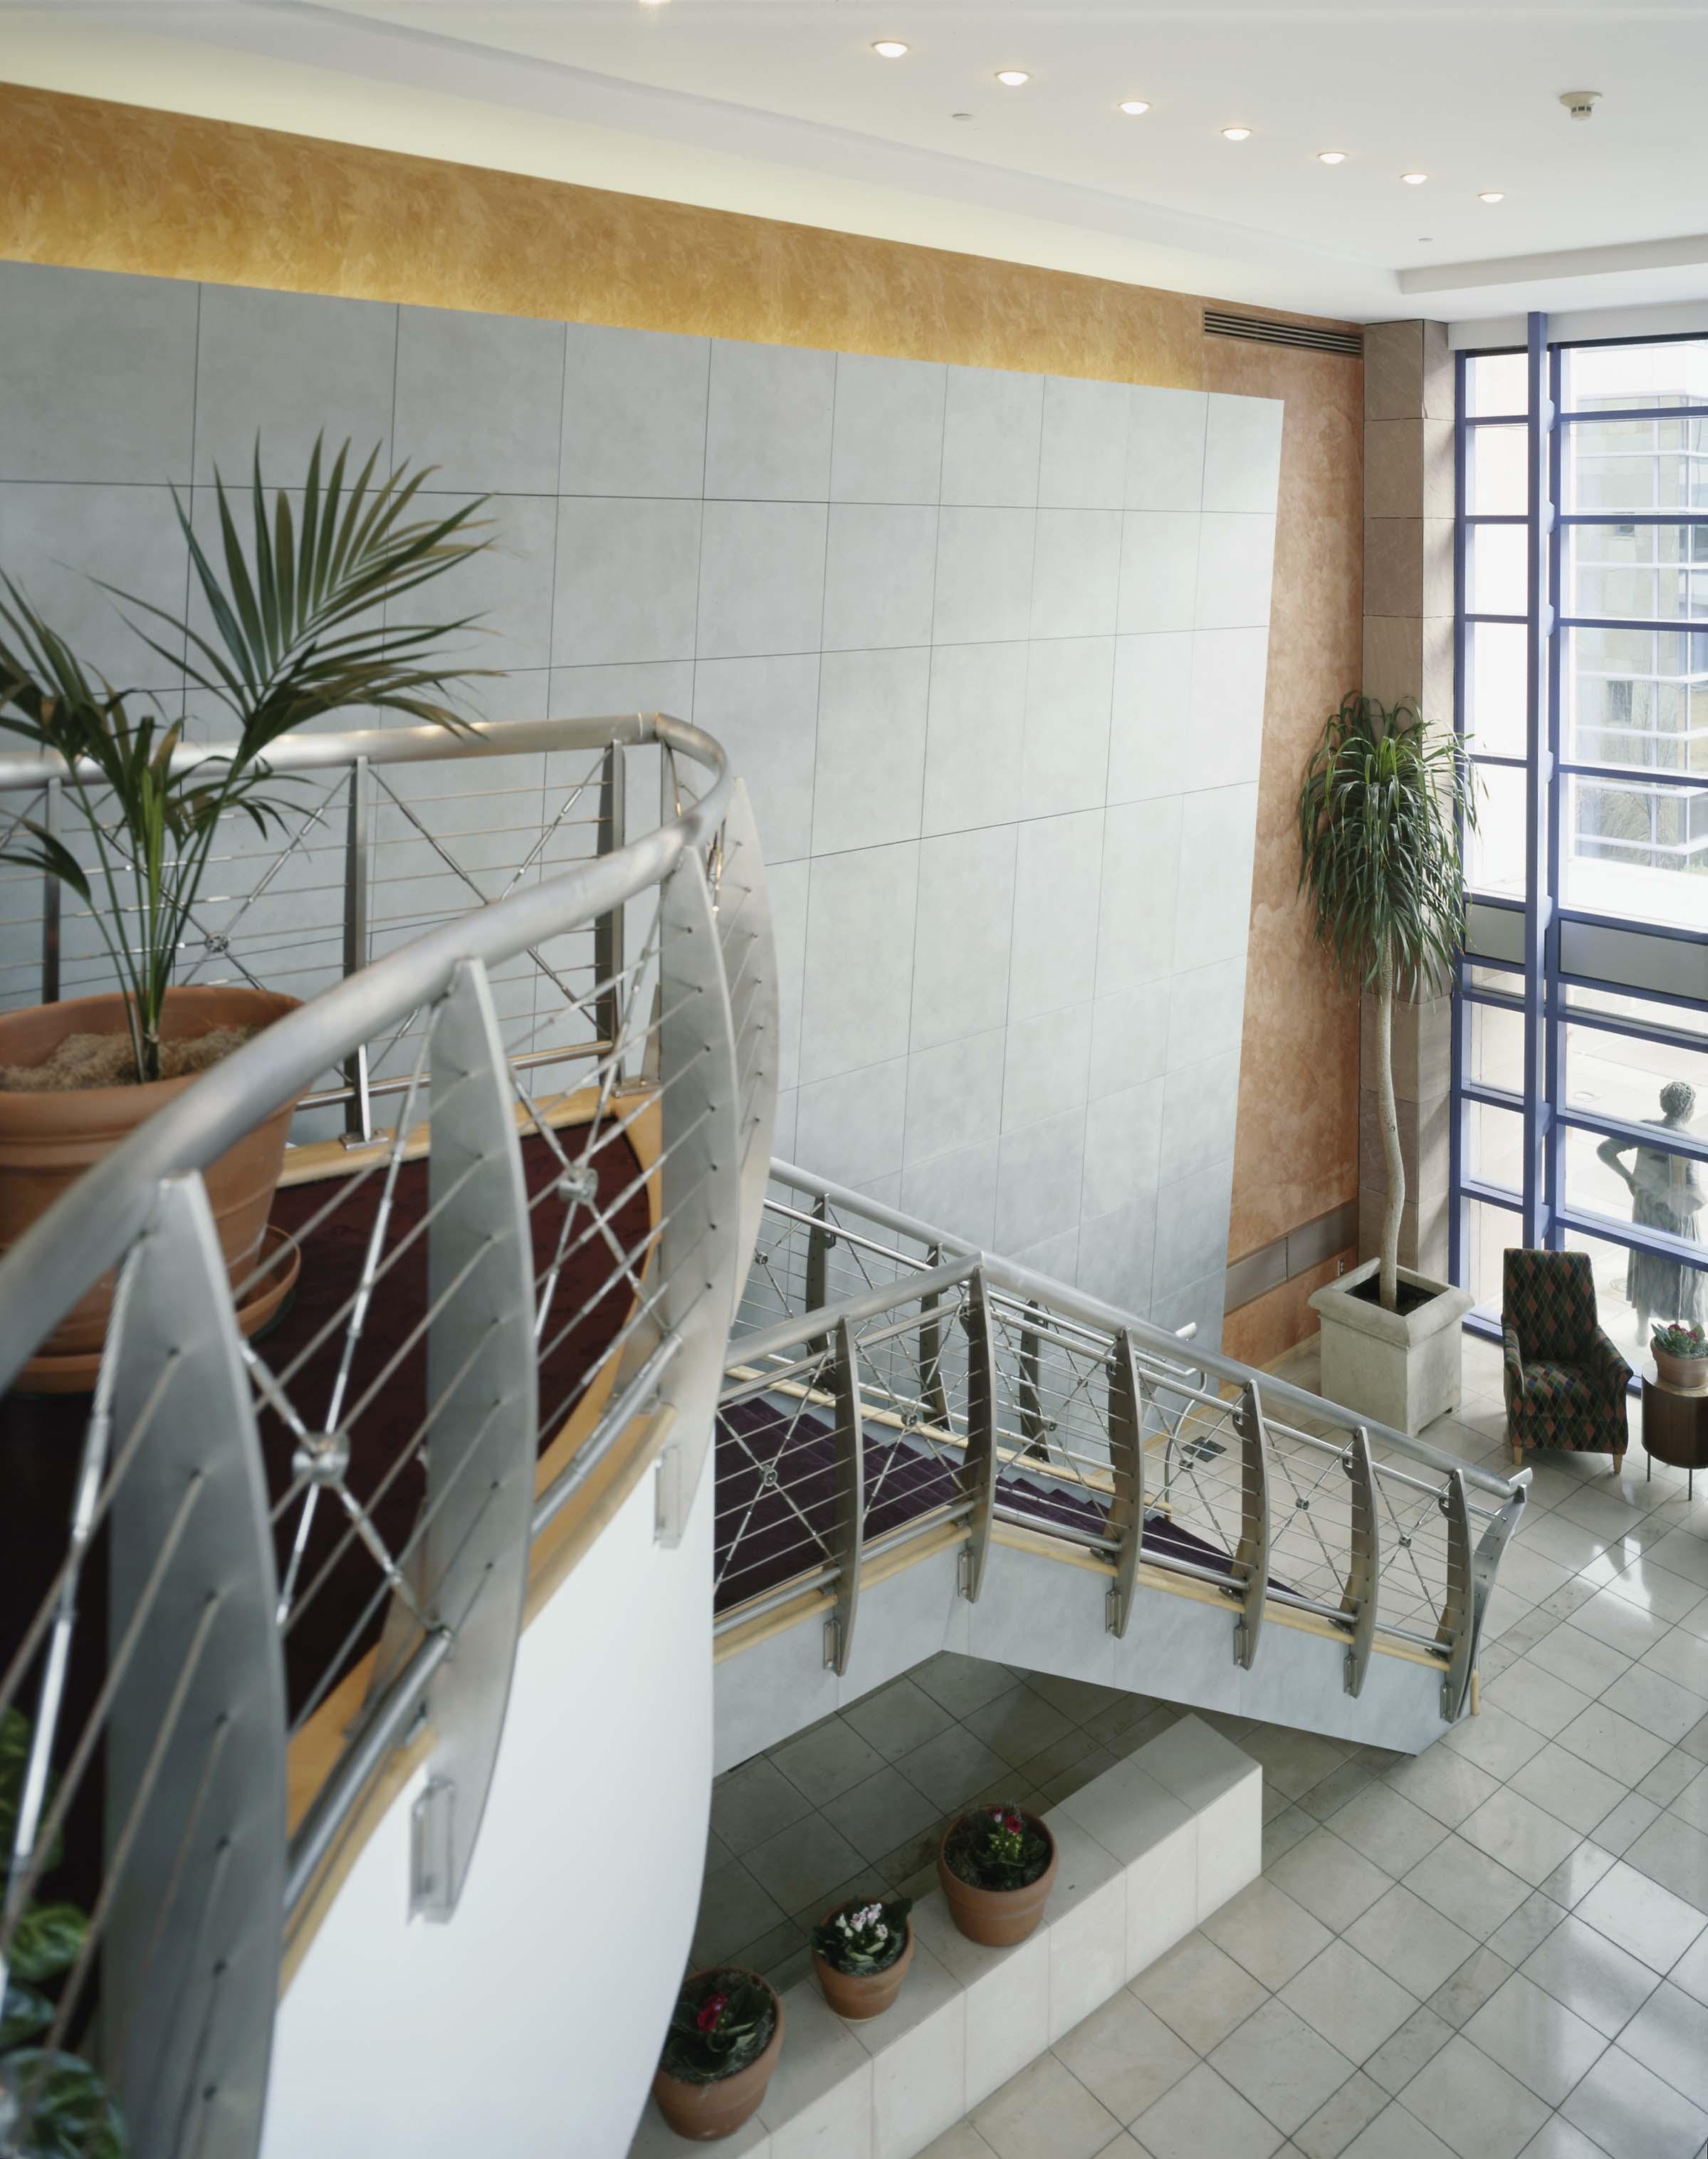 stollermetals-lobby.jpg